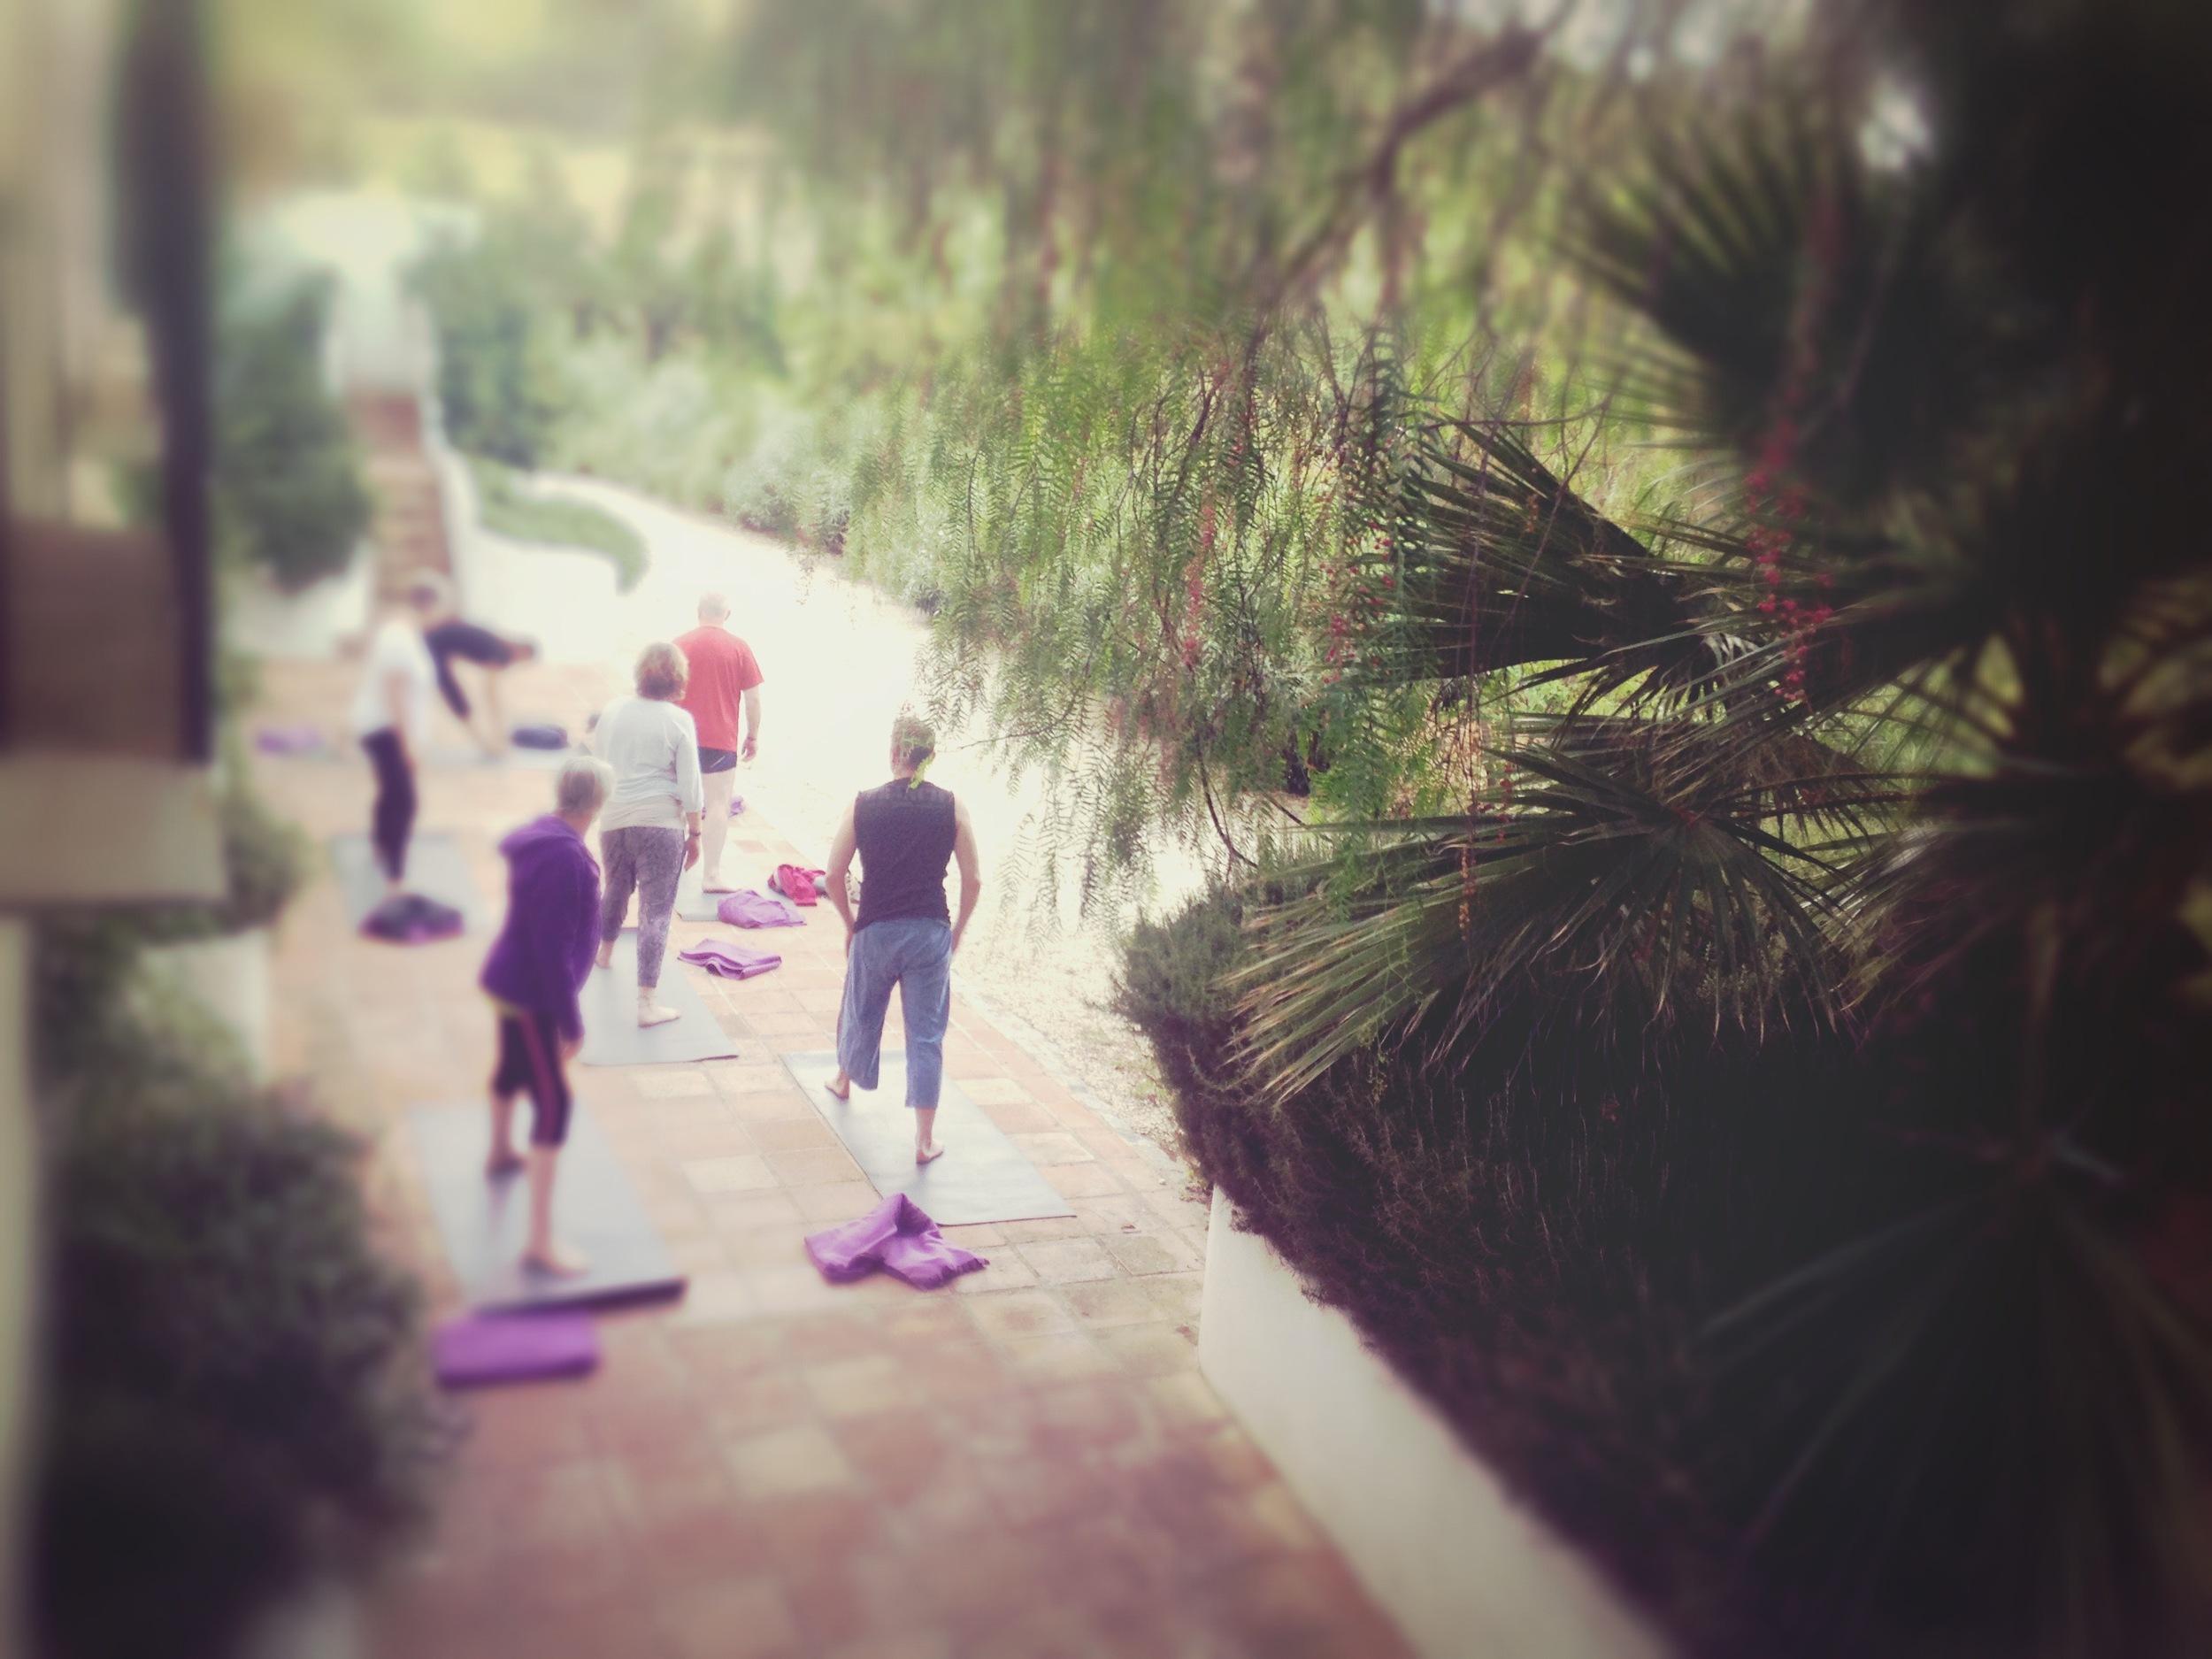 spain retreat olive retreat cleanse health massage.jpg